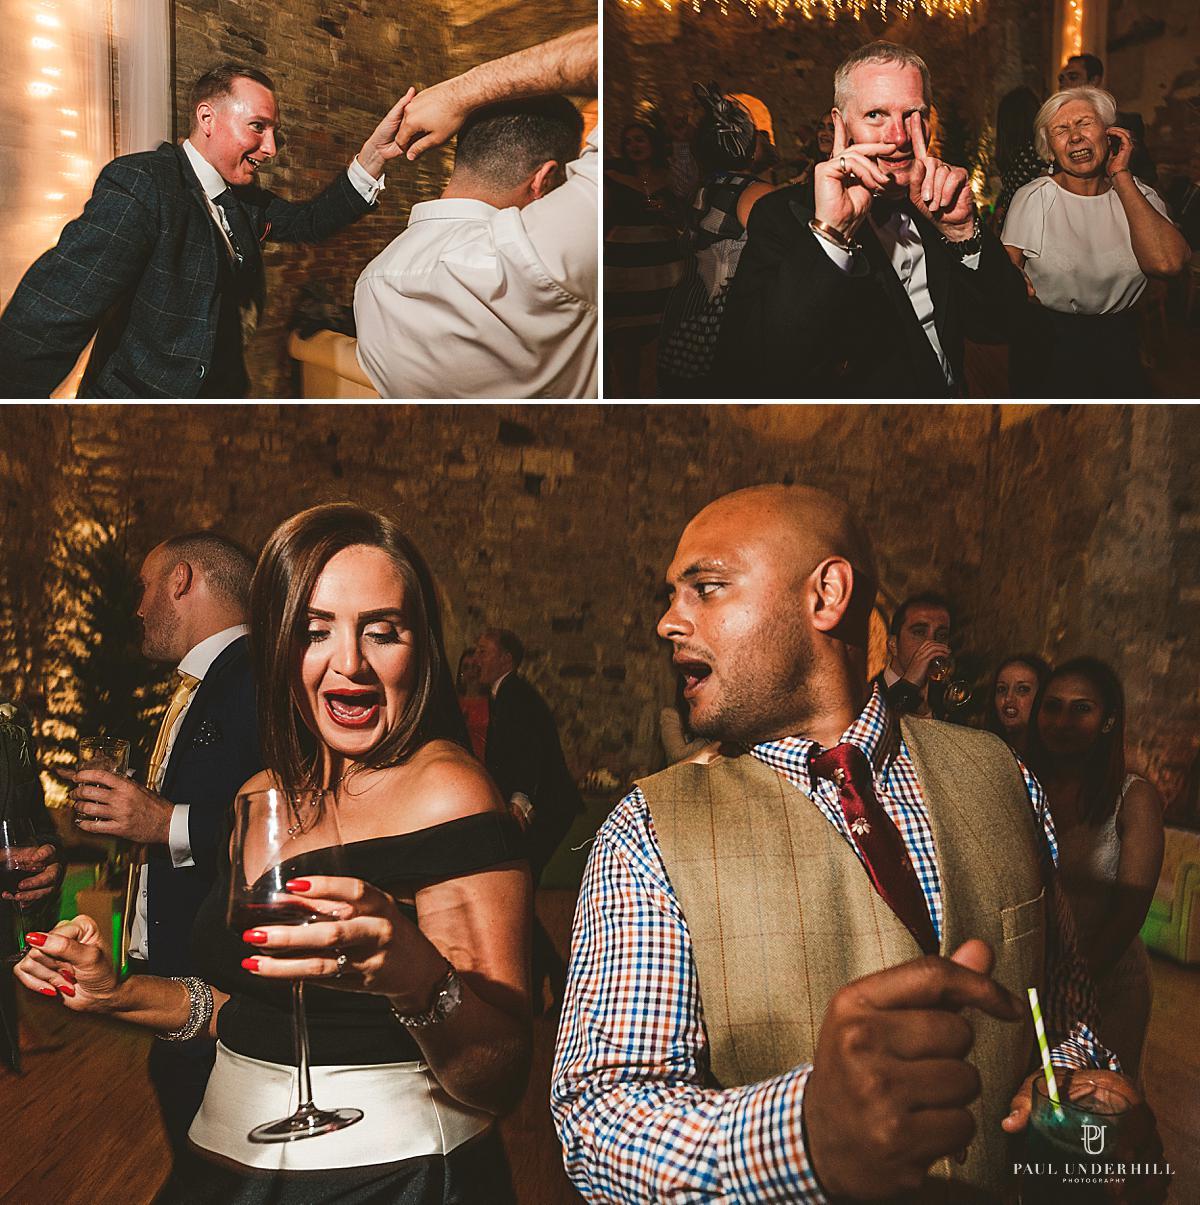 Dorset wedding photography at Lulworth Castle